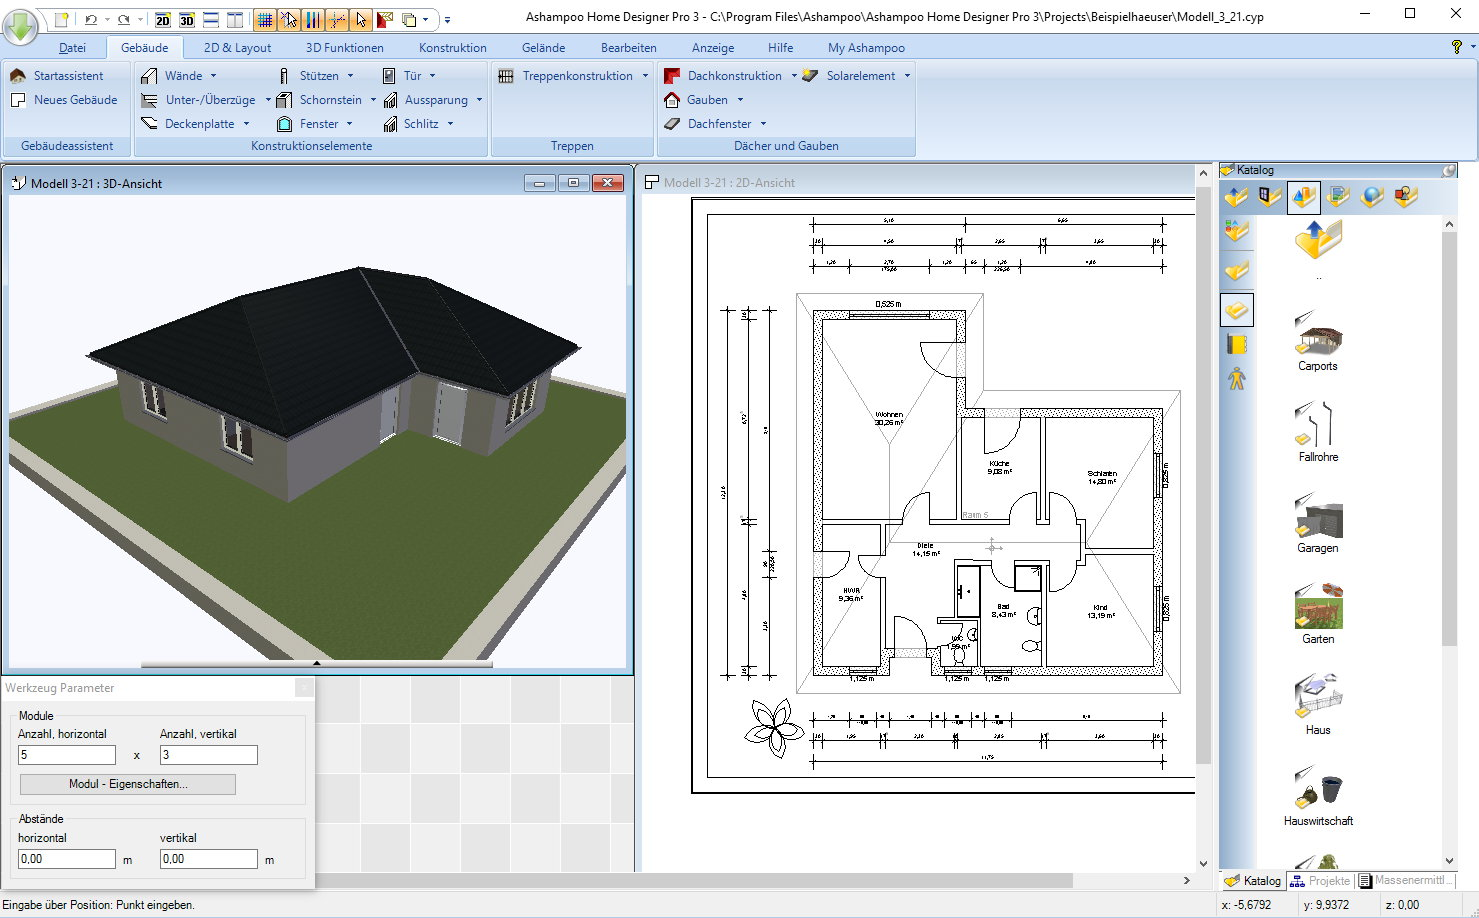 Ashampoo Home Designer Pro 3 [Download]: Amazon.de: Software